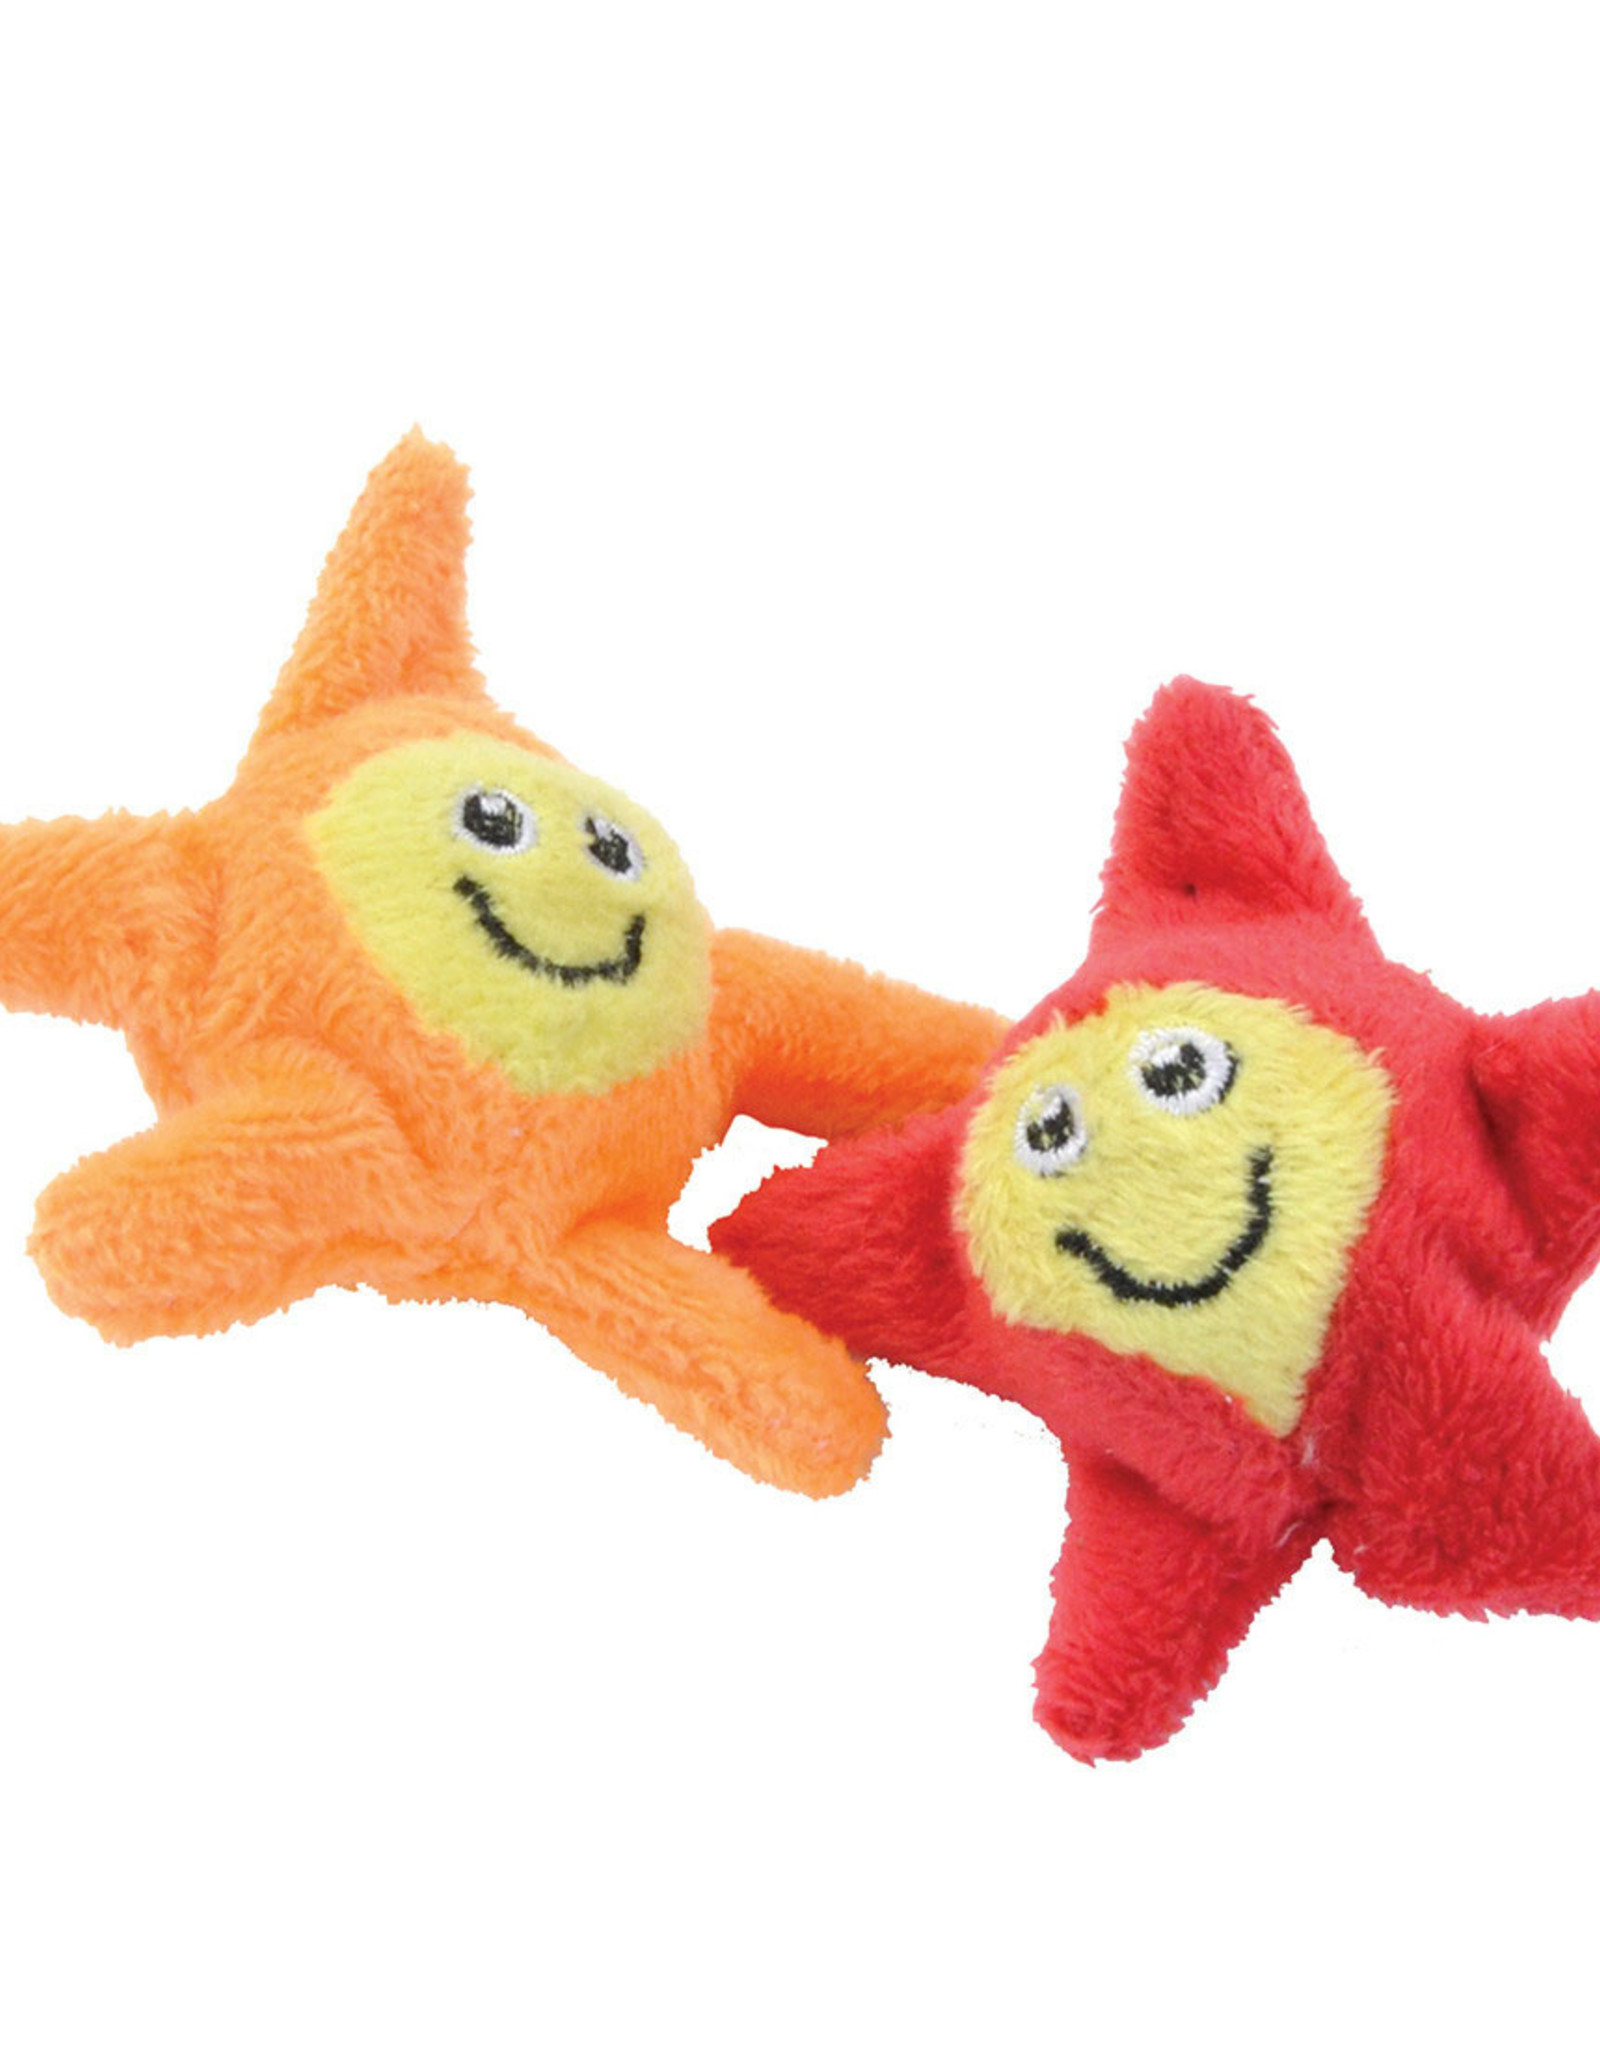 COASTAL PET PRODUCTS INC CAT TOY TURBO BOUNCY STAR 2PK